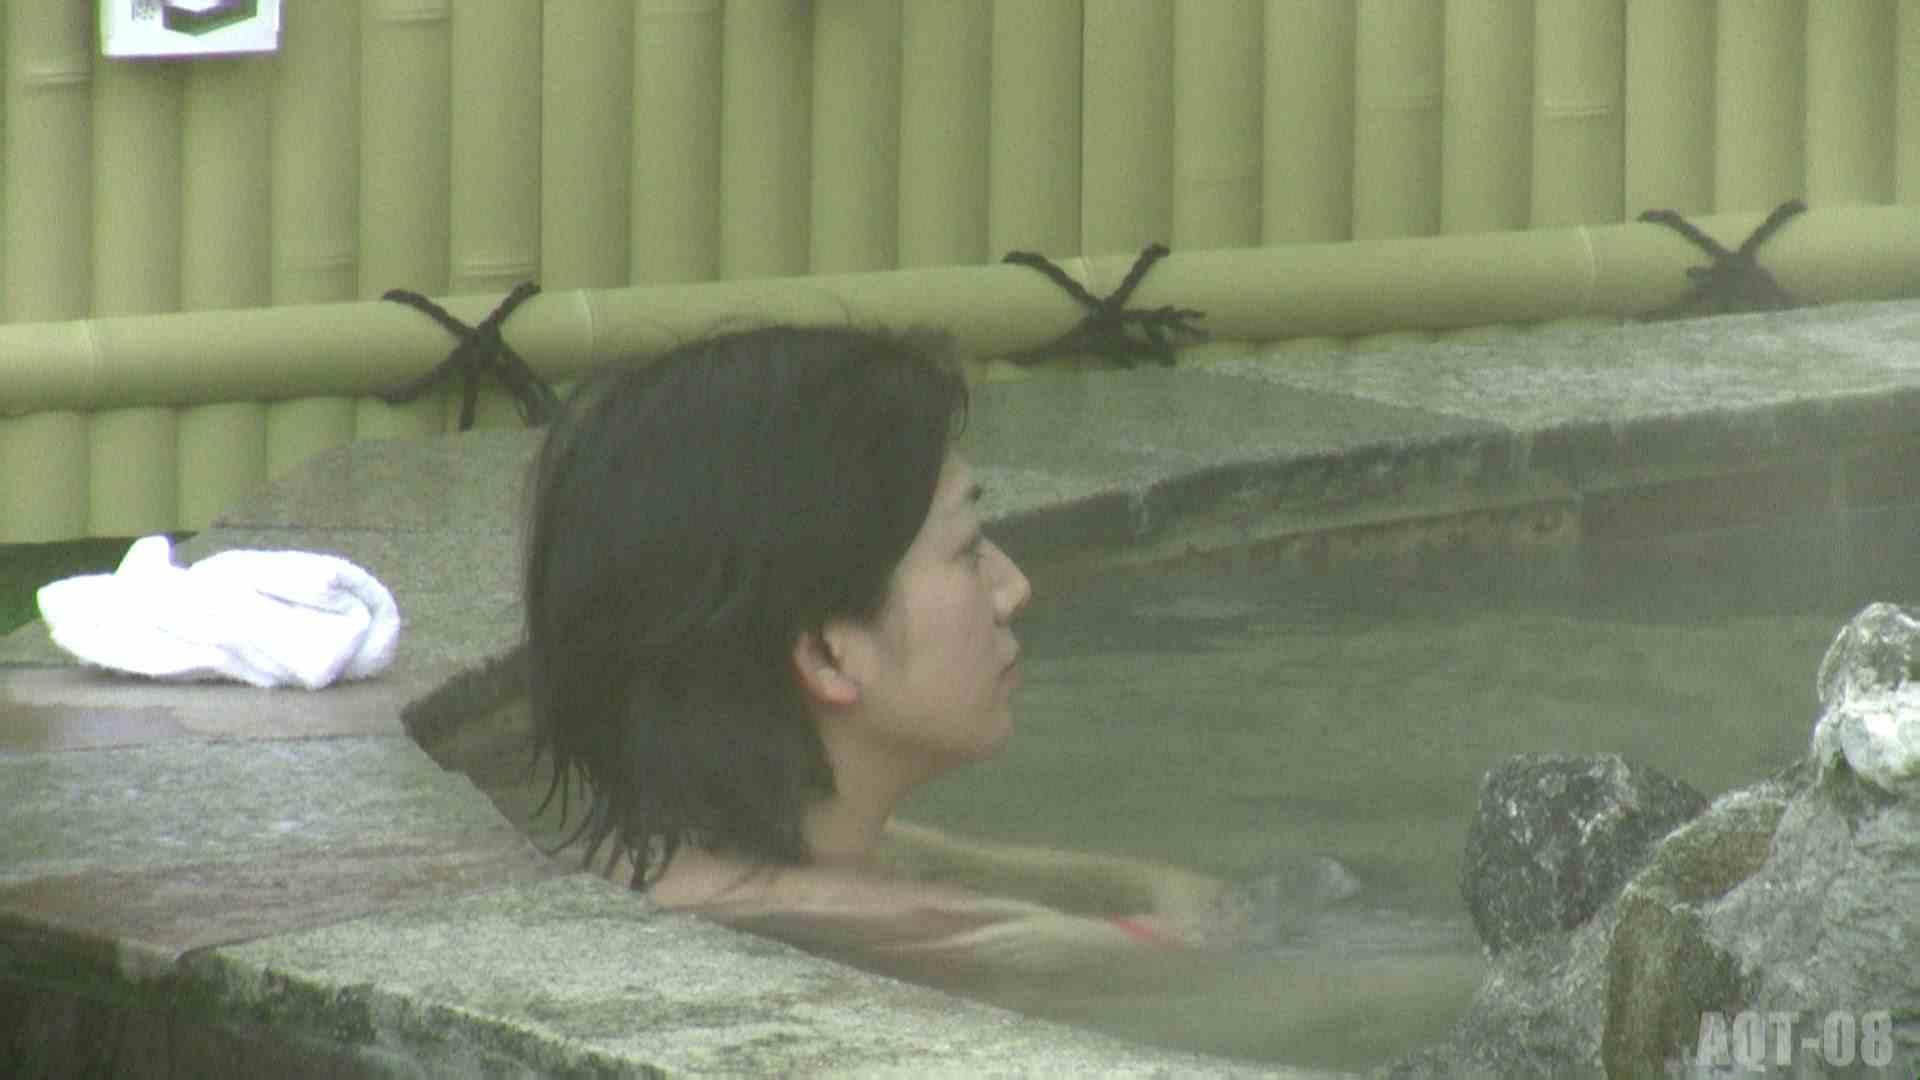 Aquaな露天風呂Vol.776 露天風呂編  75PIX 66